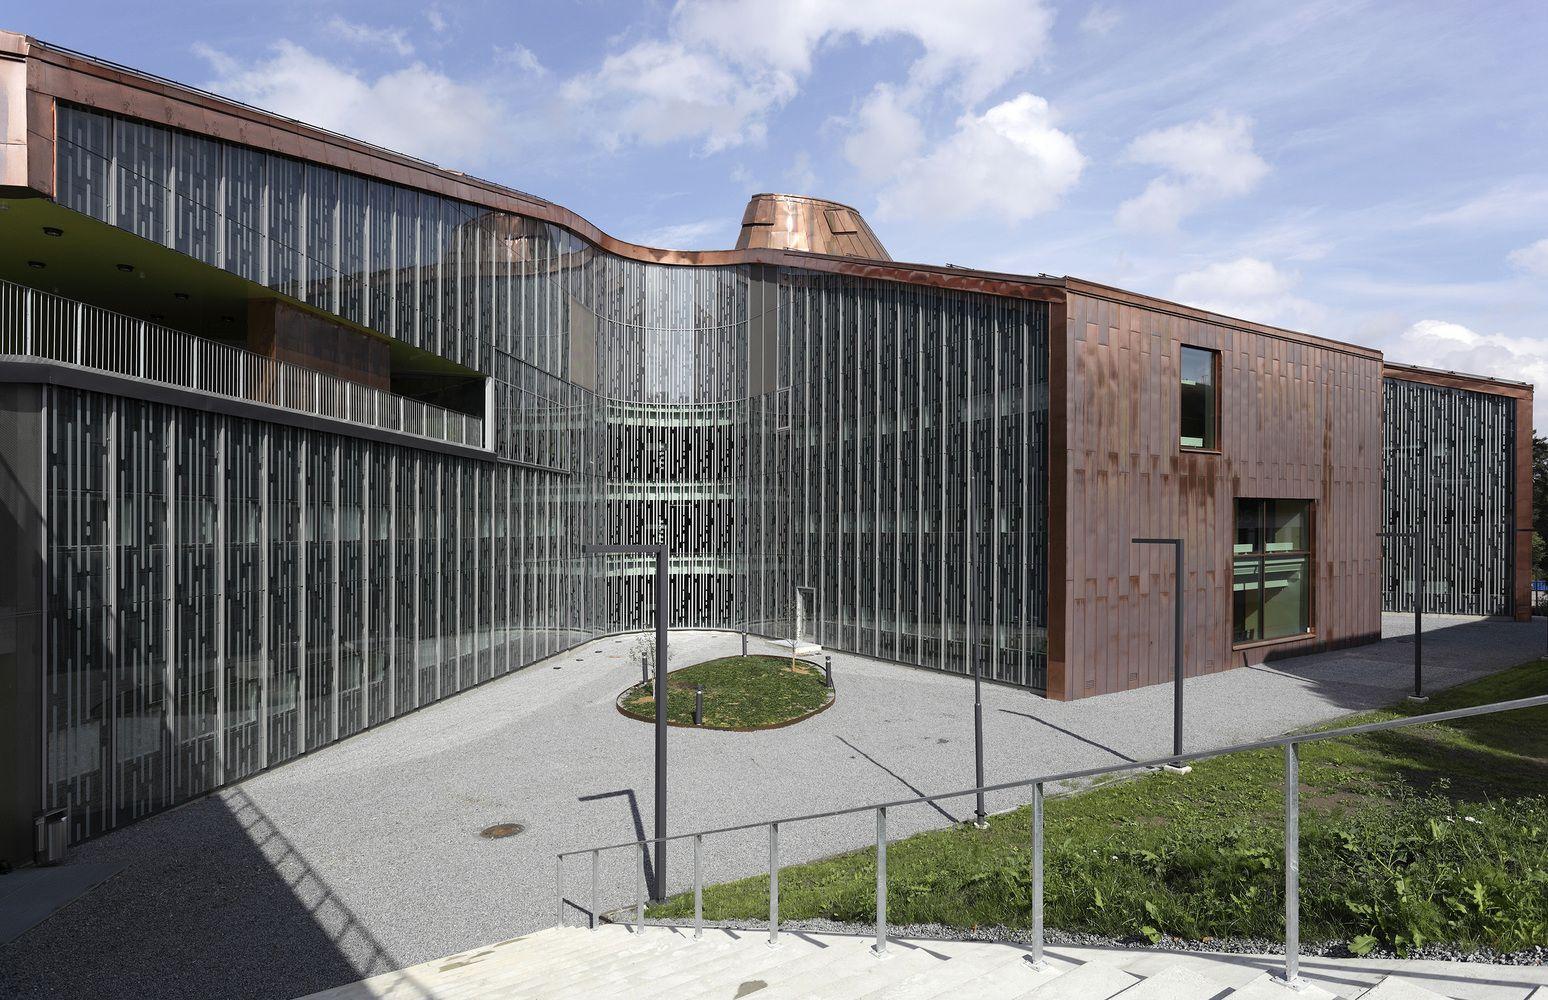 Gallery of Tipotie Health Center / Sigge Arkkitehdit Oy